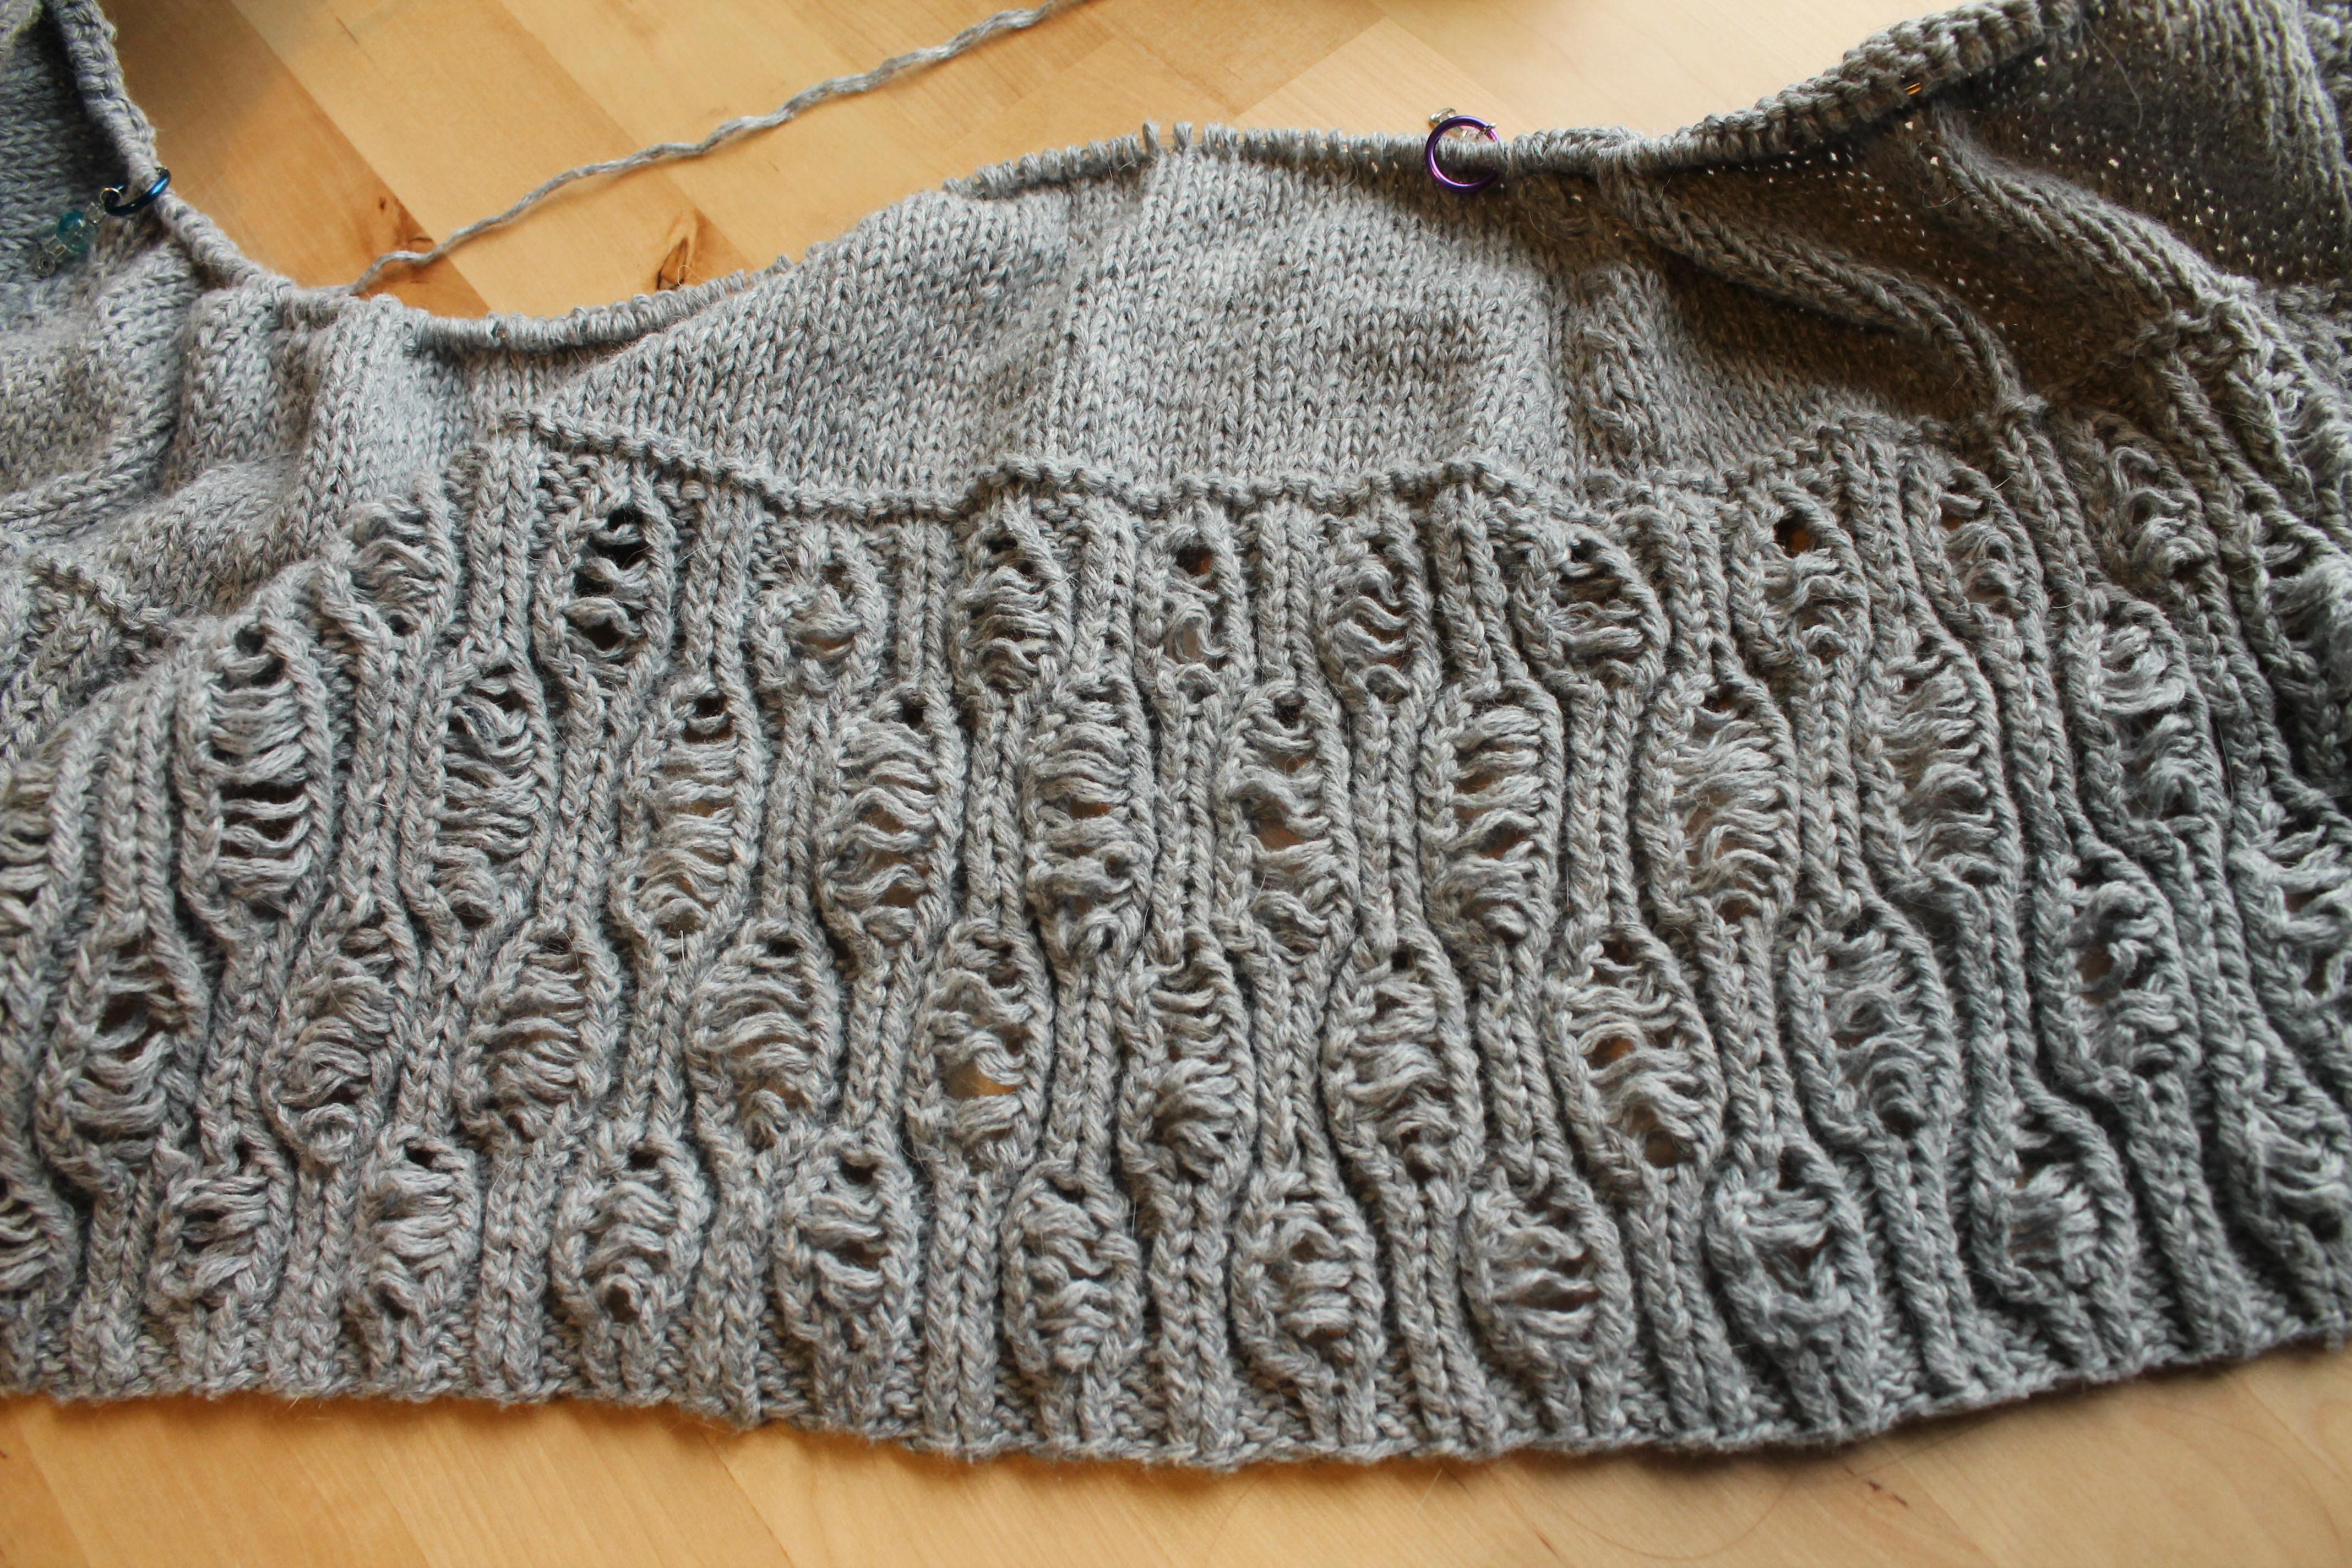 Roheline cardigan (in progress)